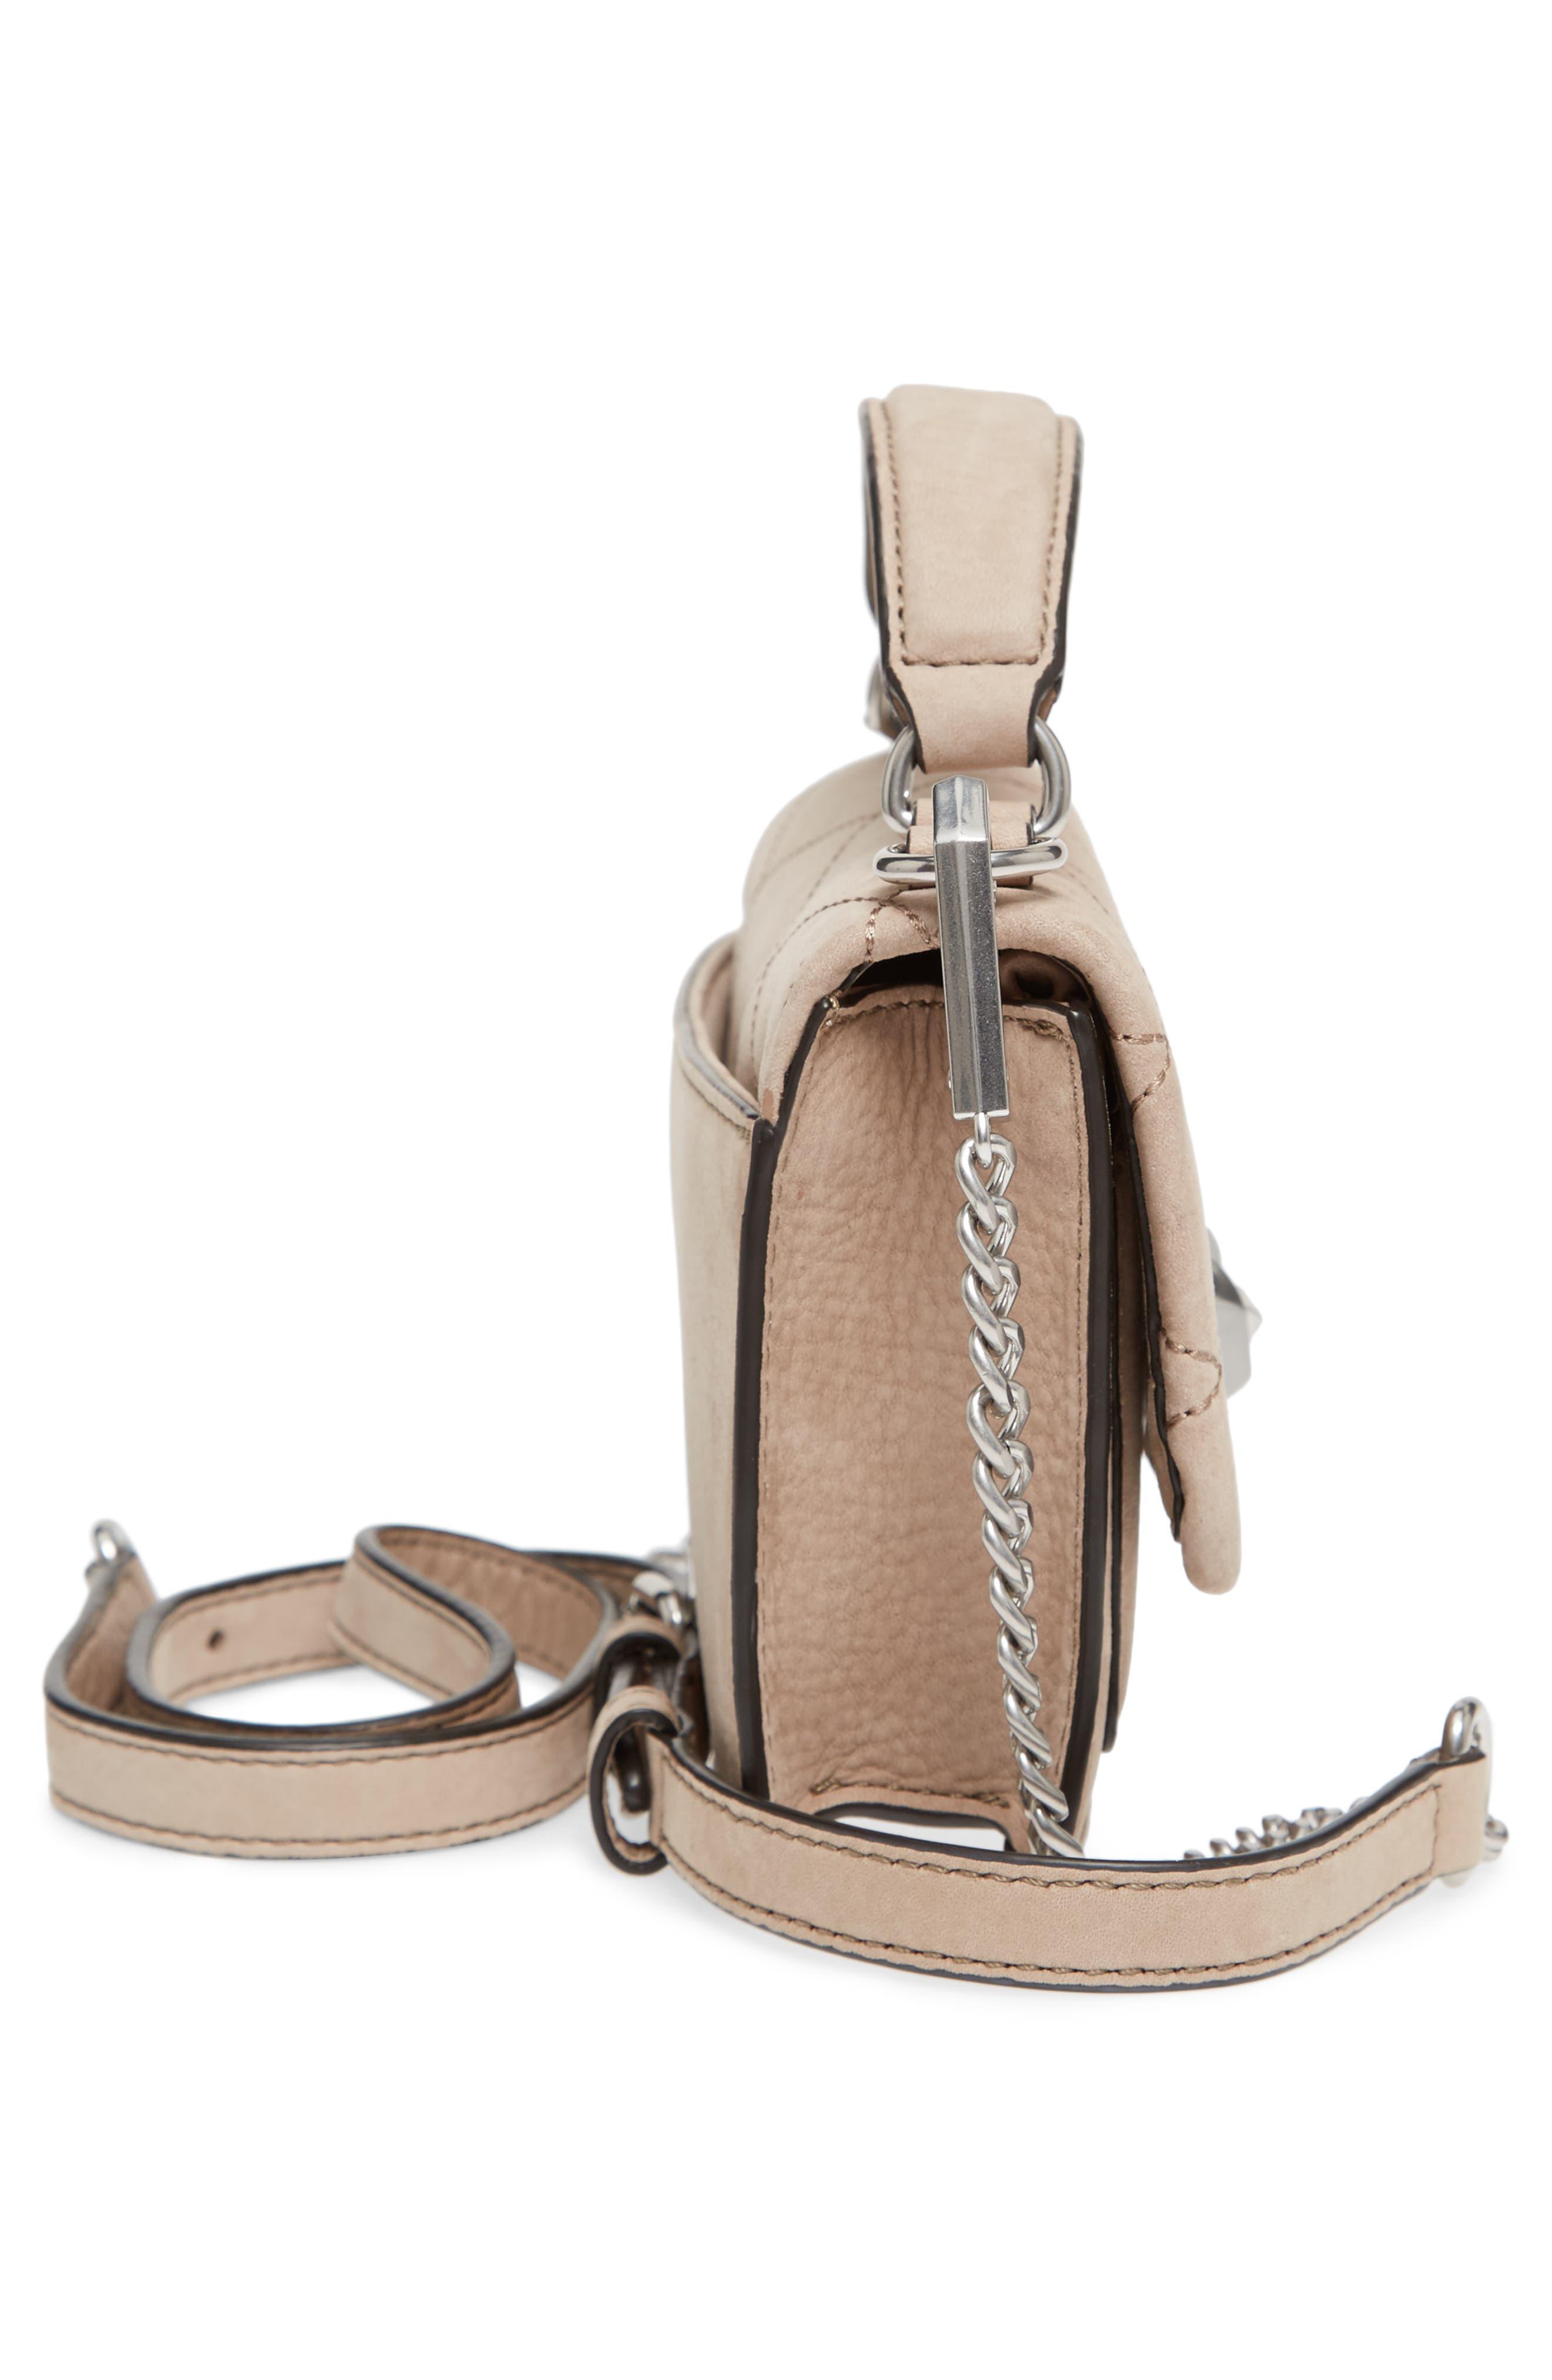 Small Je T'aime Leather Crossbody Bag,                             Alternate thumbnail 5, color,                             265